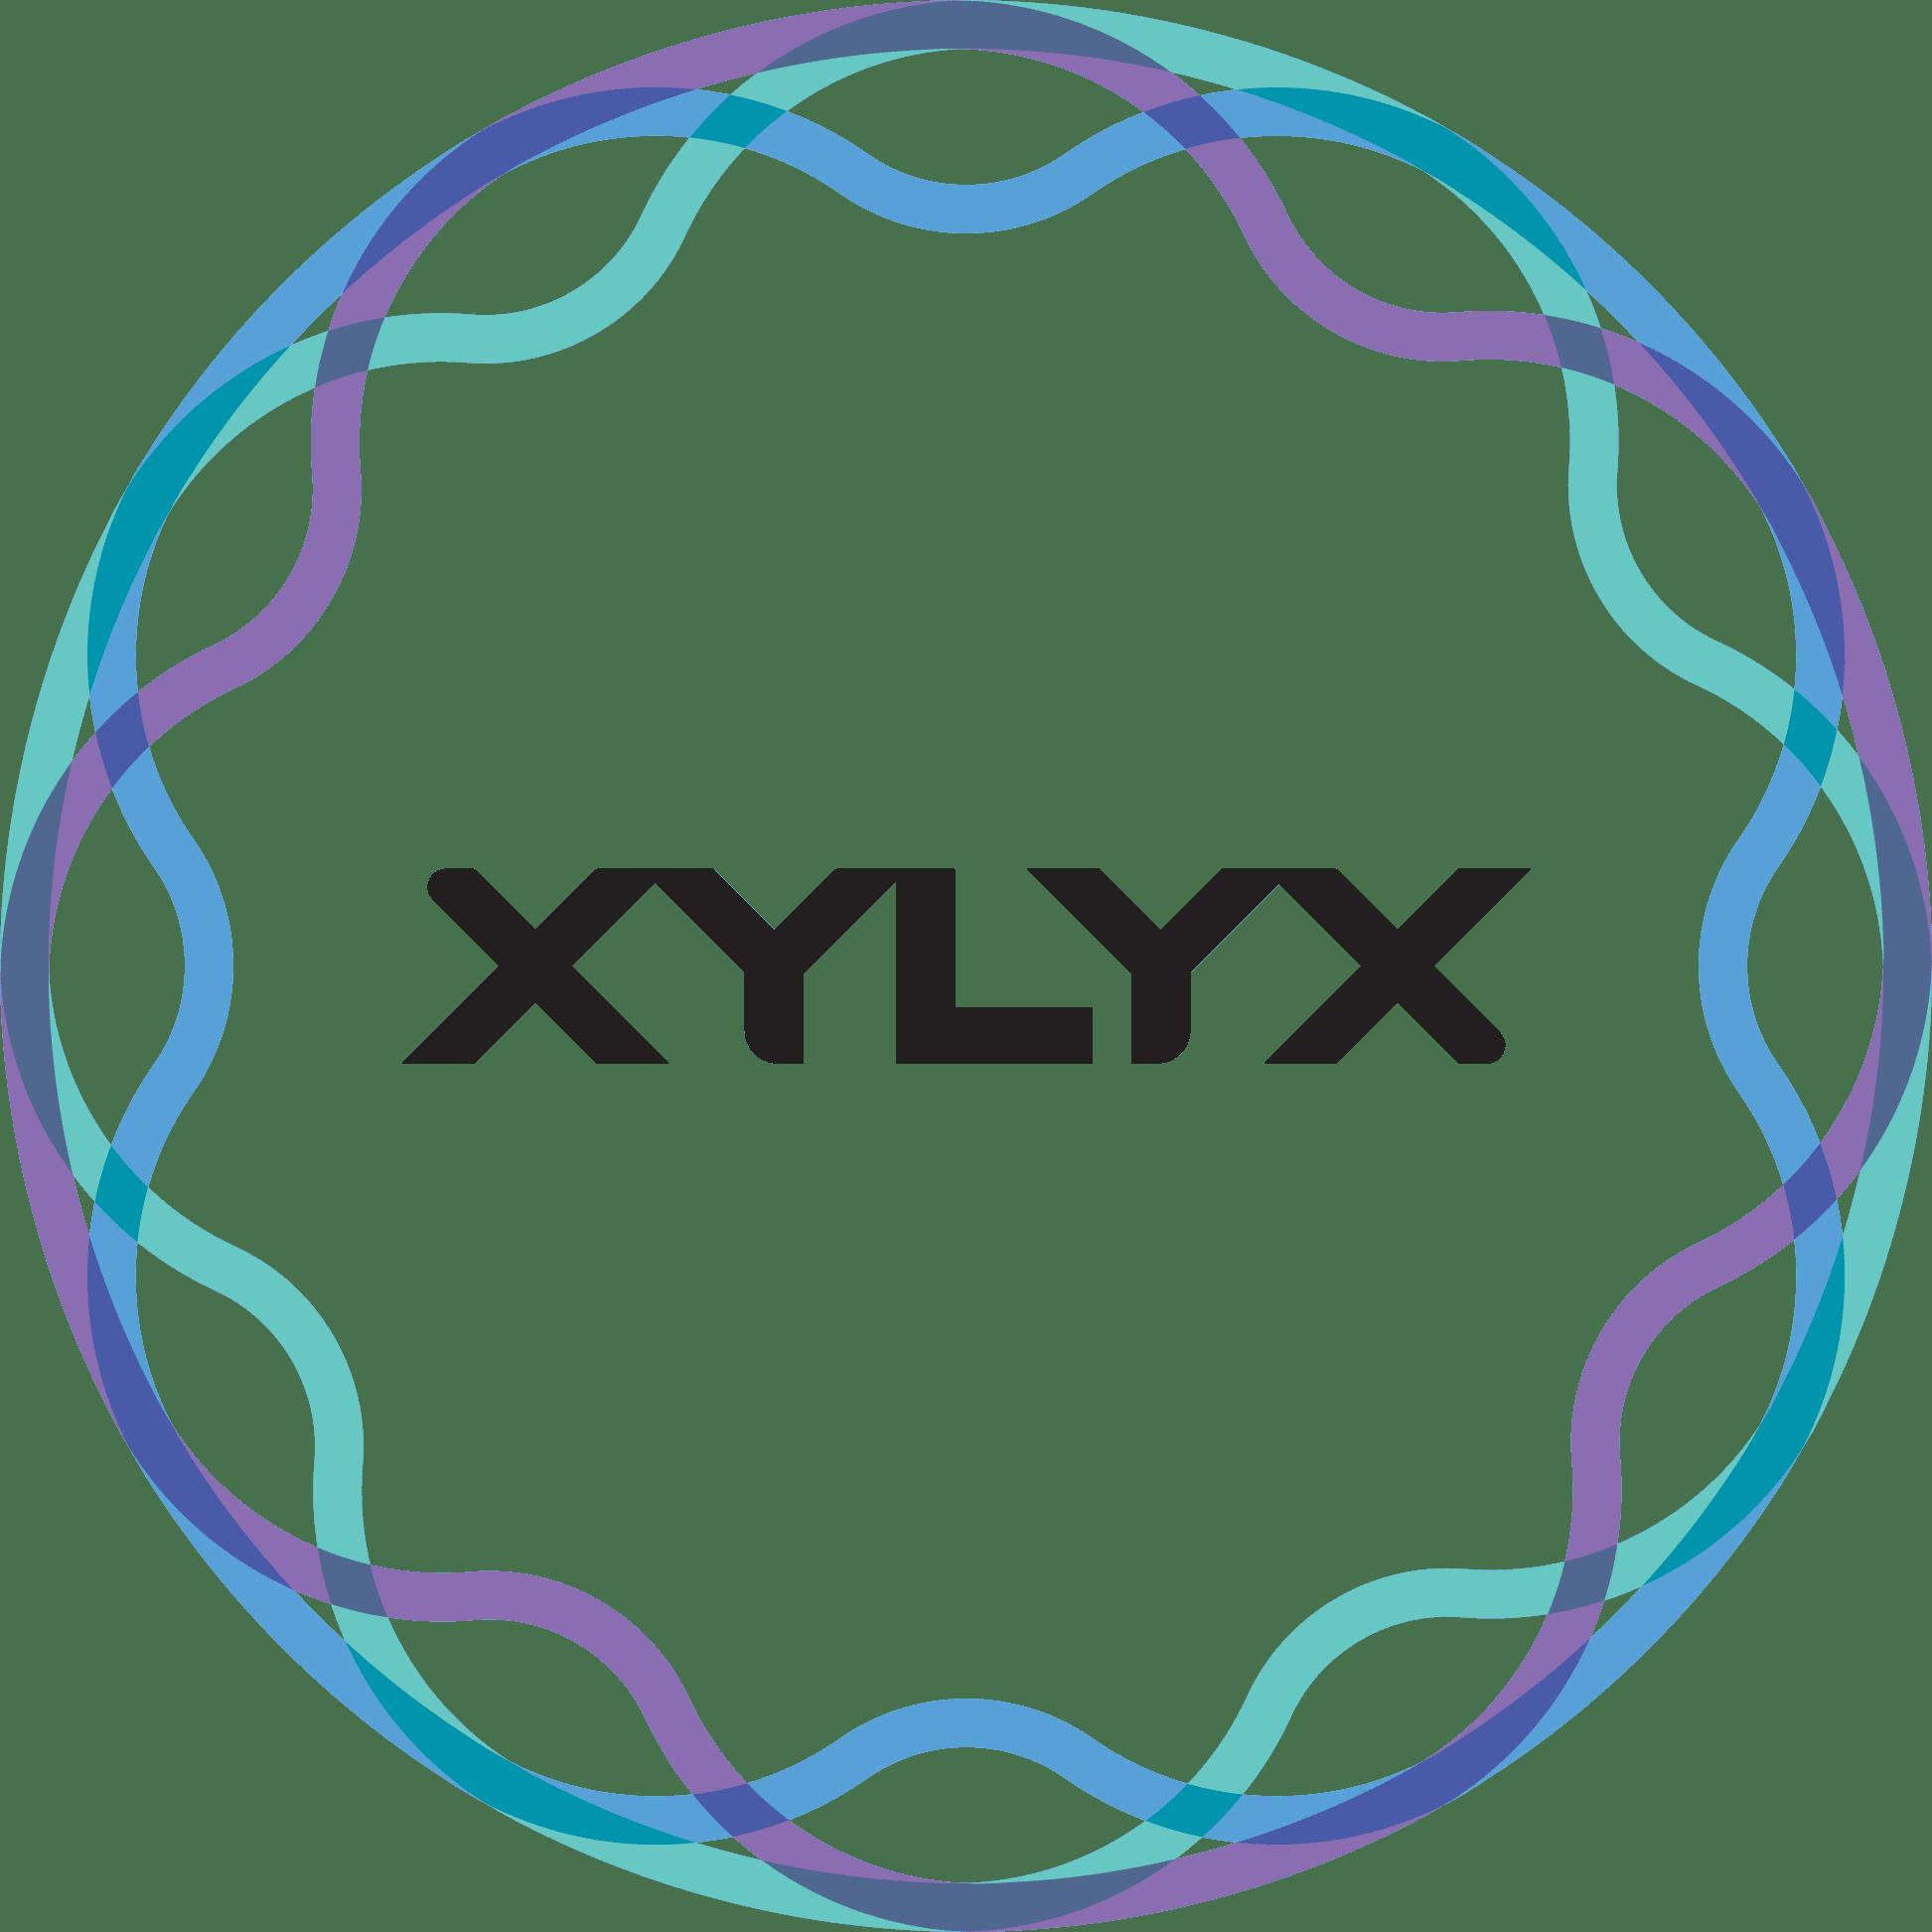 Xylyx logo - IPF partner